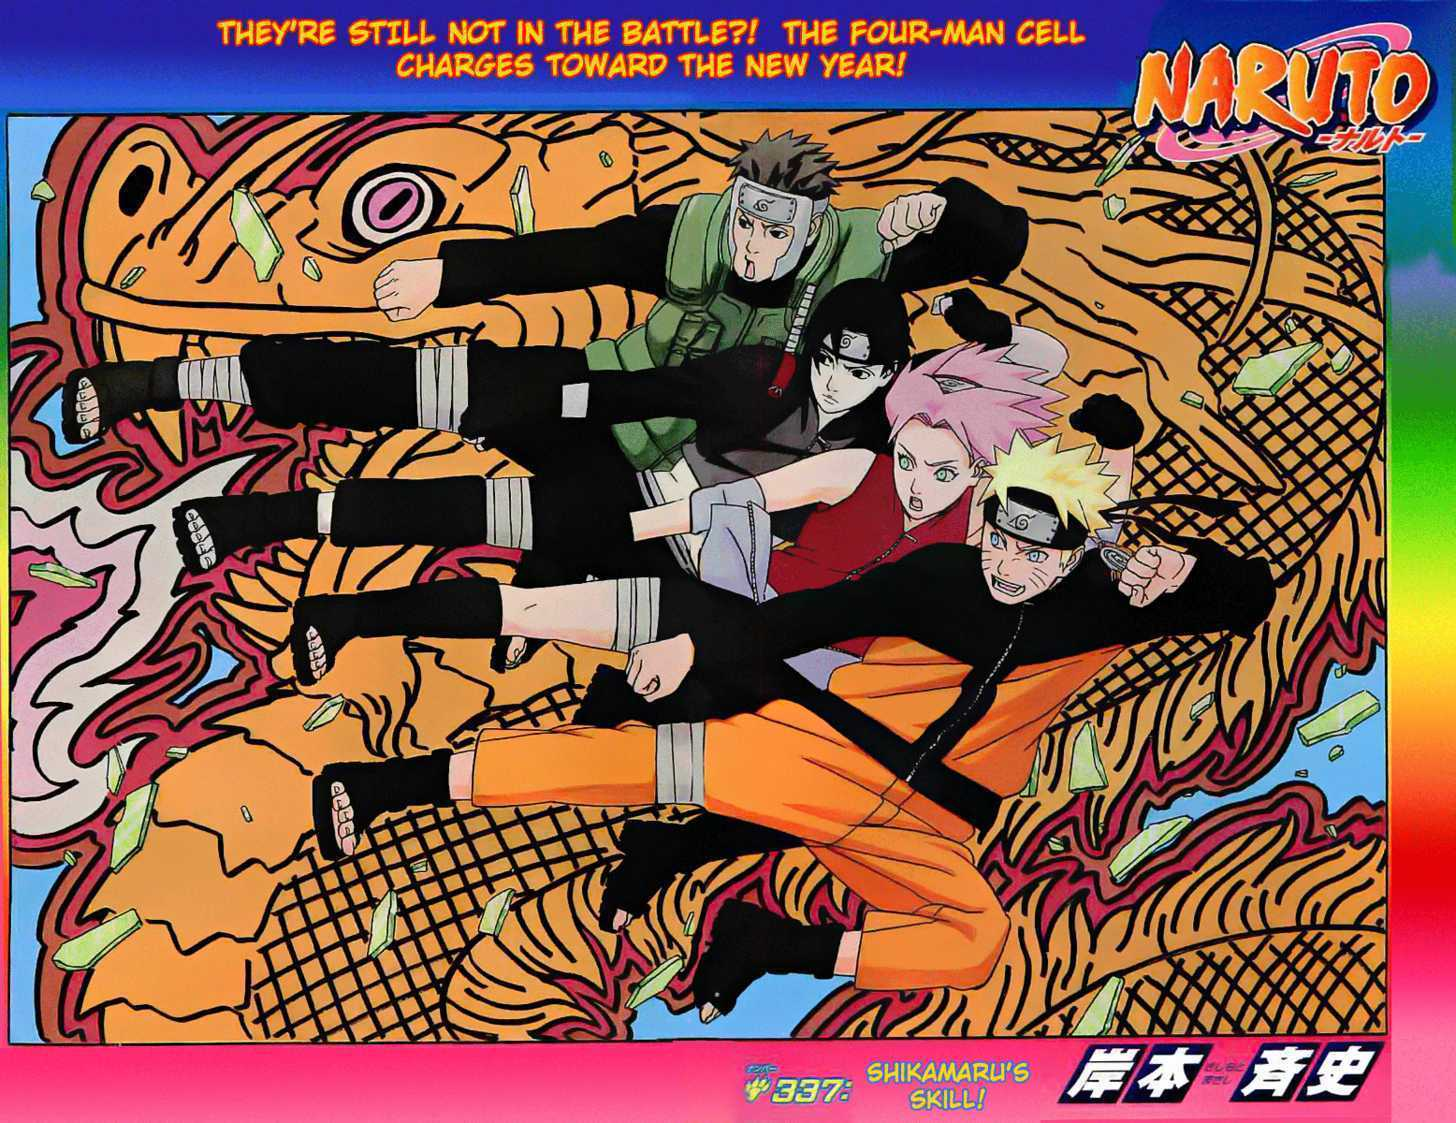 http://im.nineanime.com/comics/pic9/33/289/22704/Naruto3370980.jpg Page 1